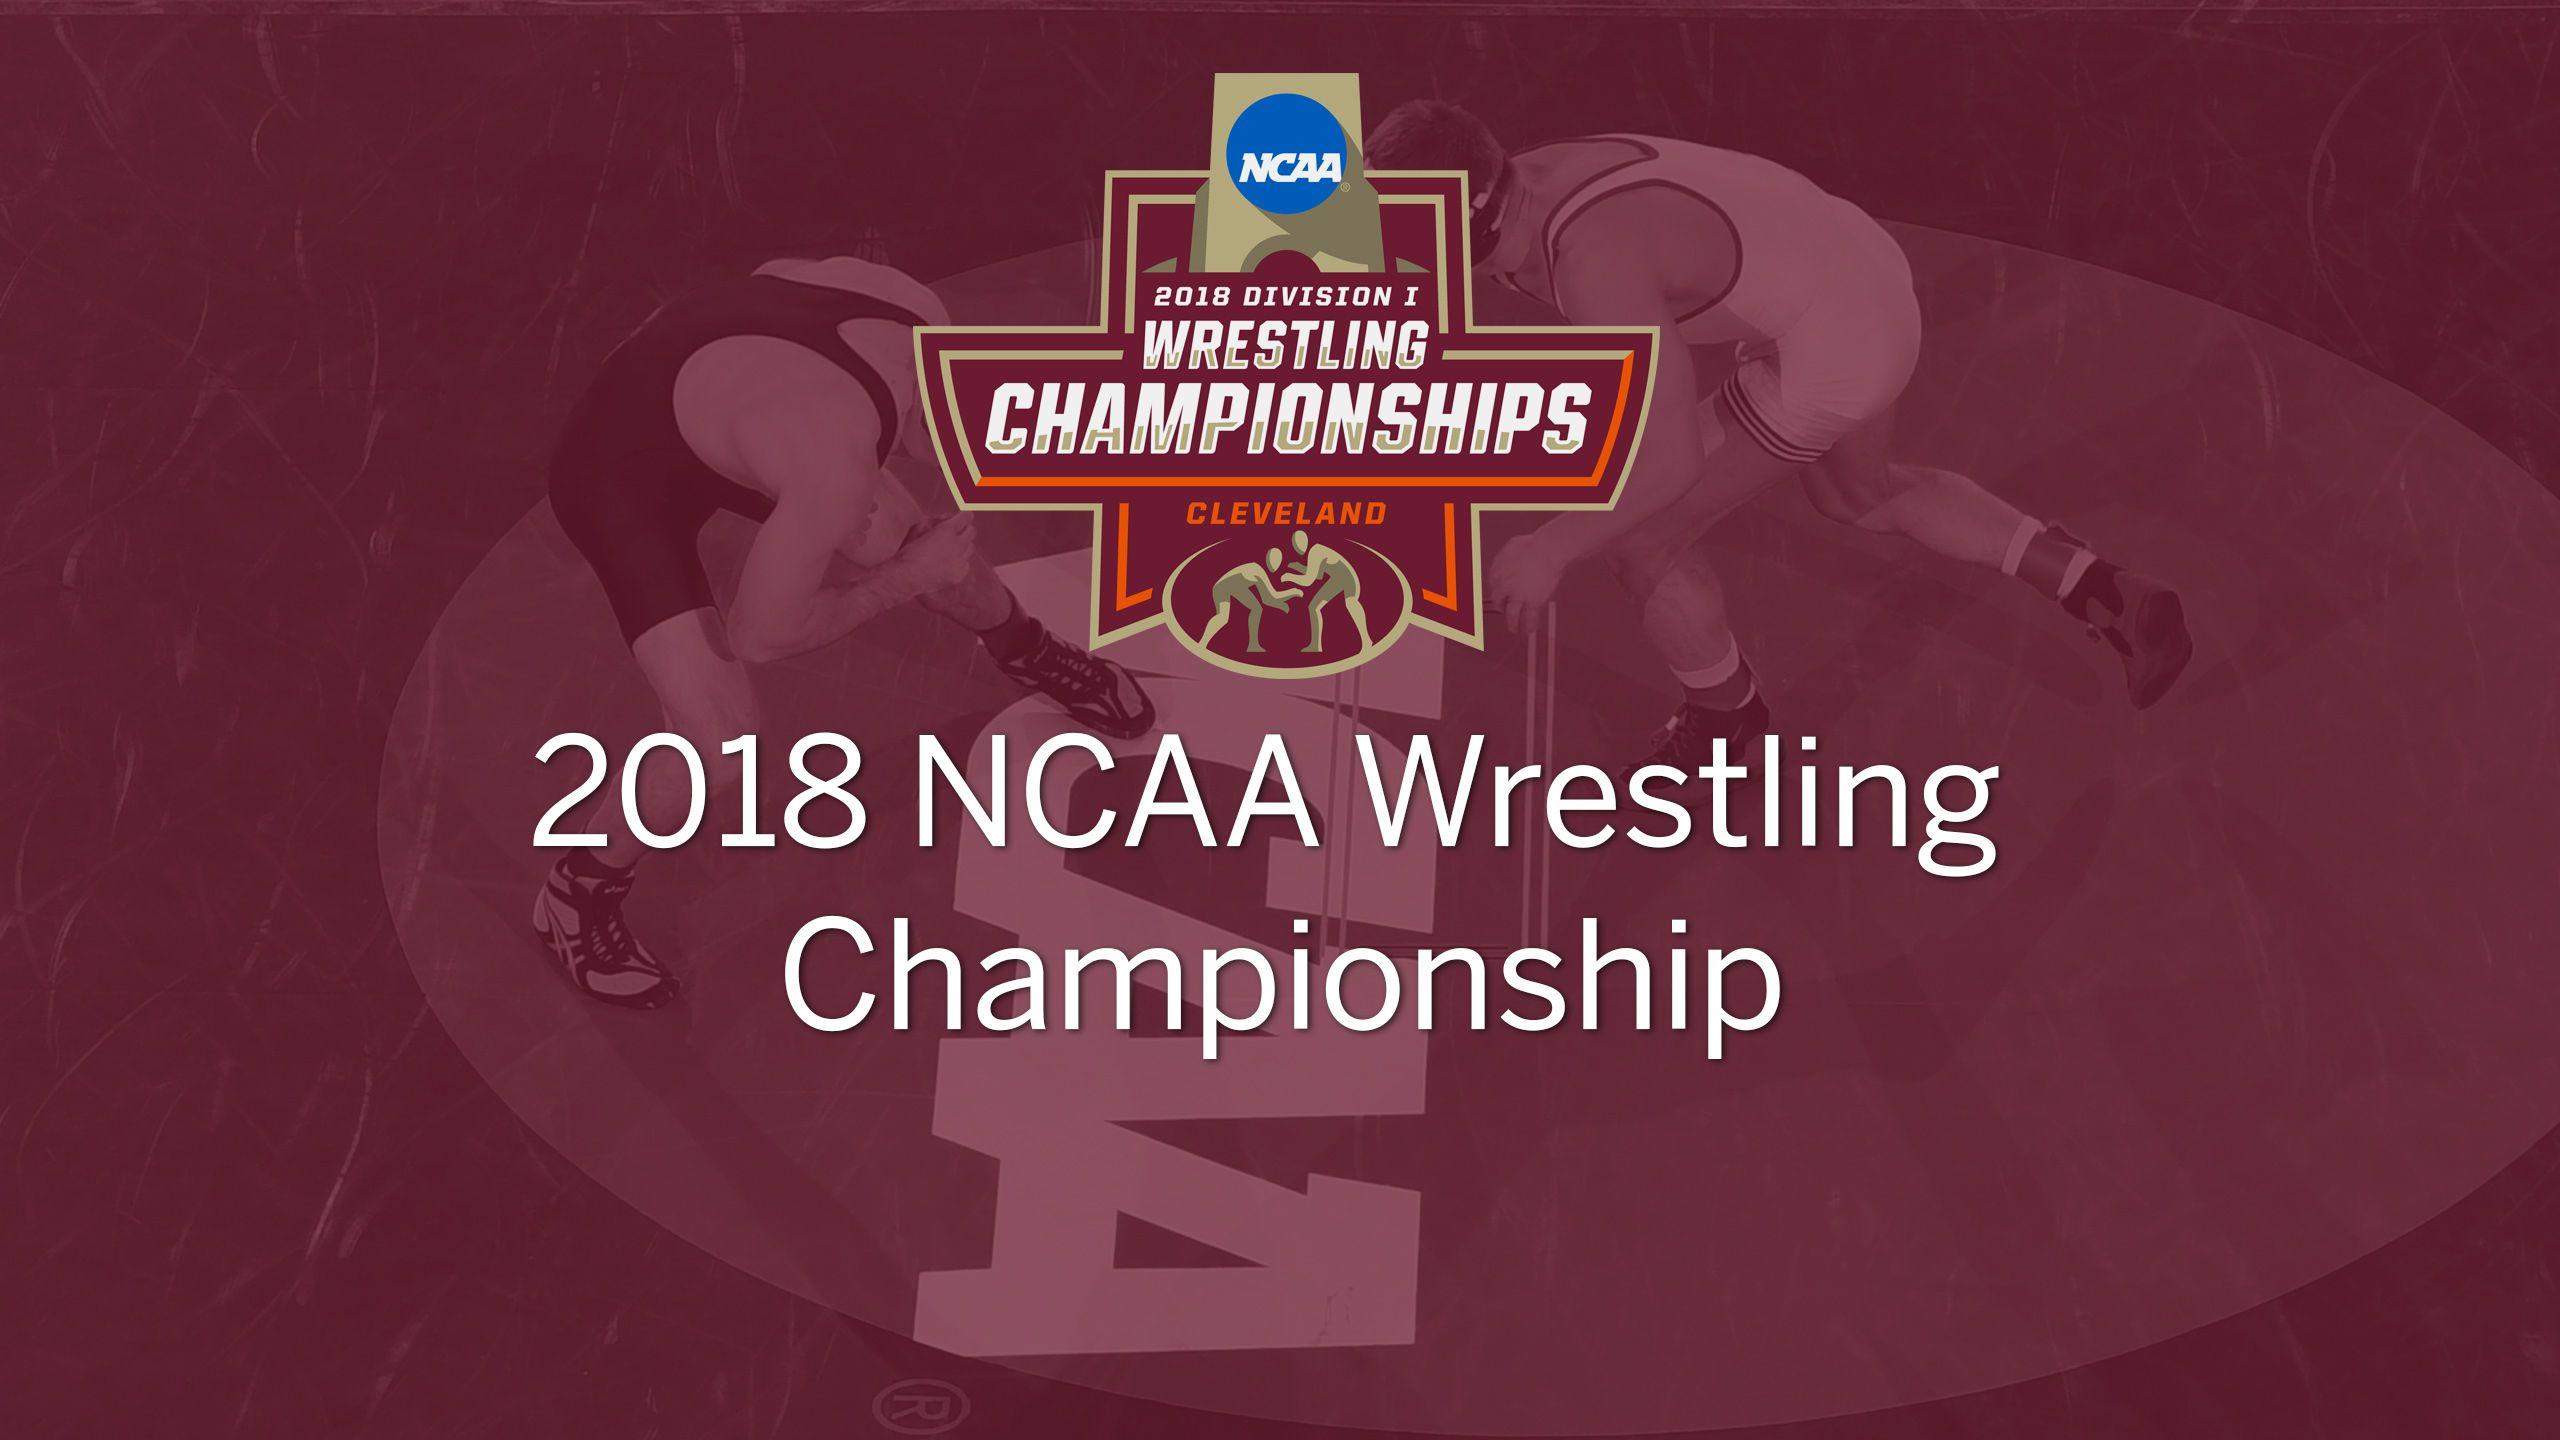 2018 NCAA Wrestling Championship (Championship)